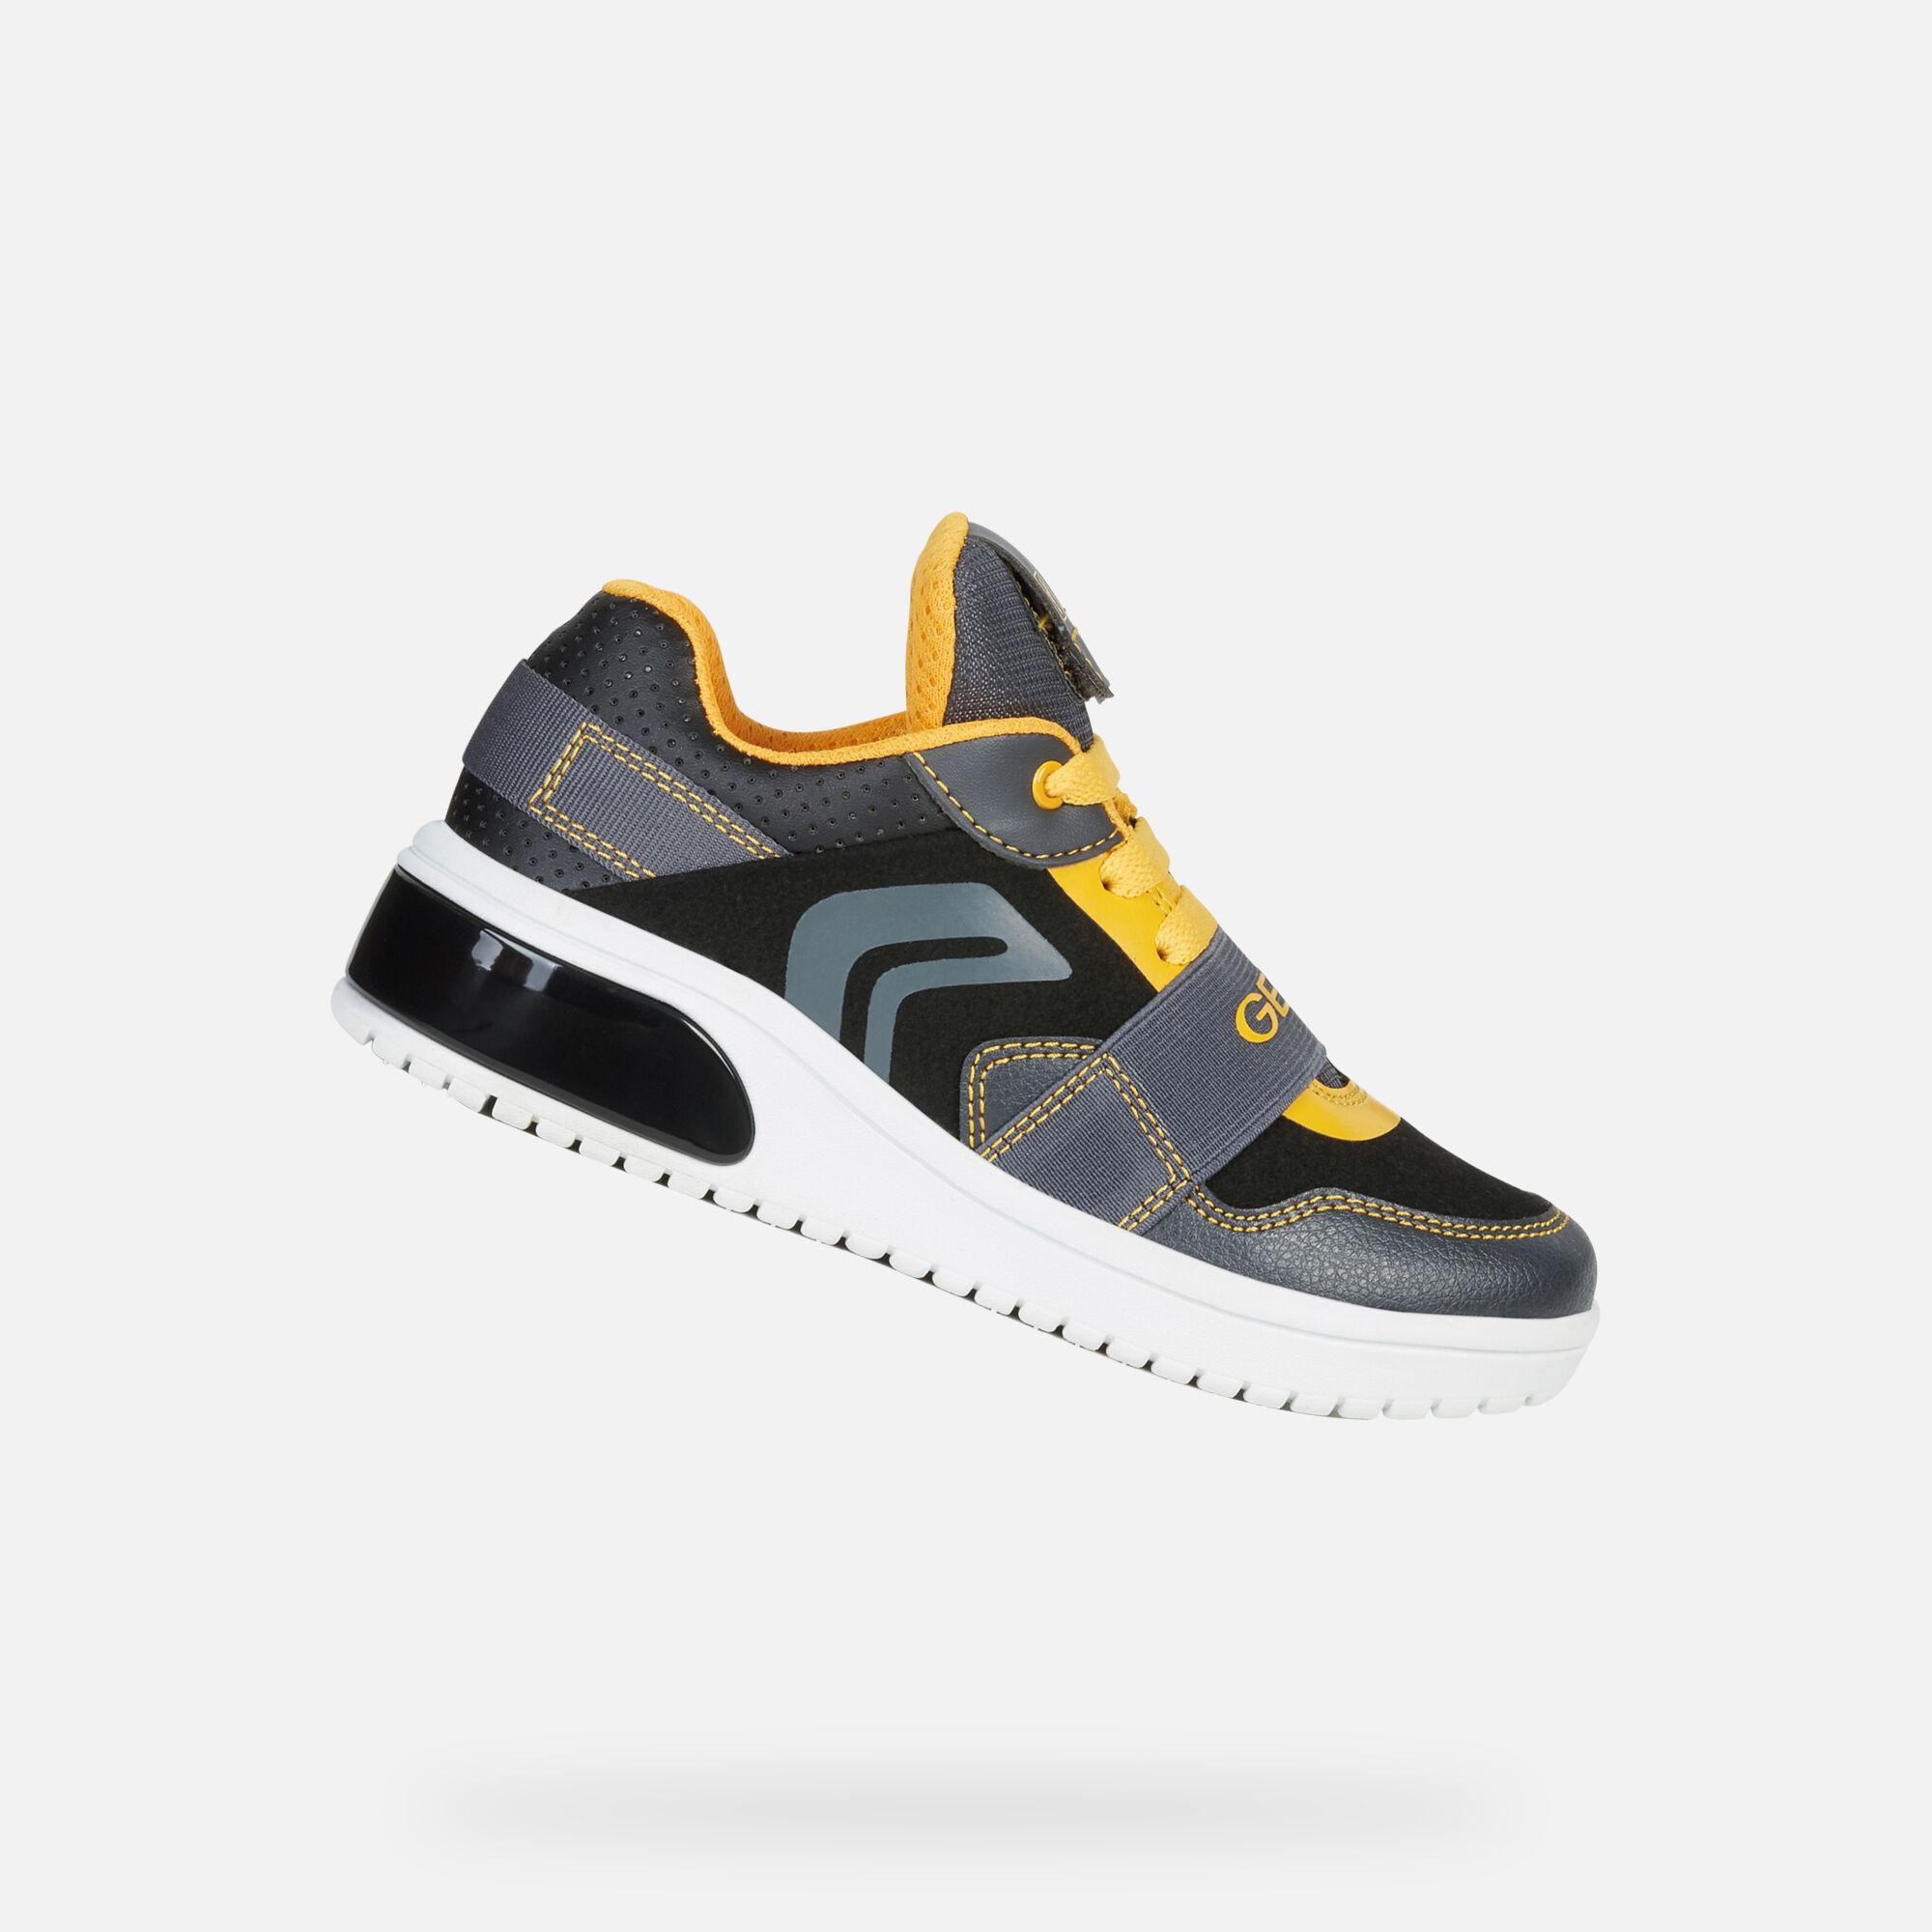 GEOX XLED Bimbo: Sneakers Basse Nere | GEOX FW1920 | Geox